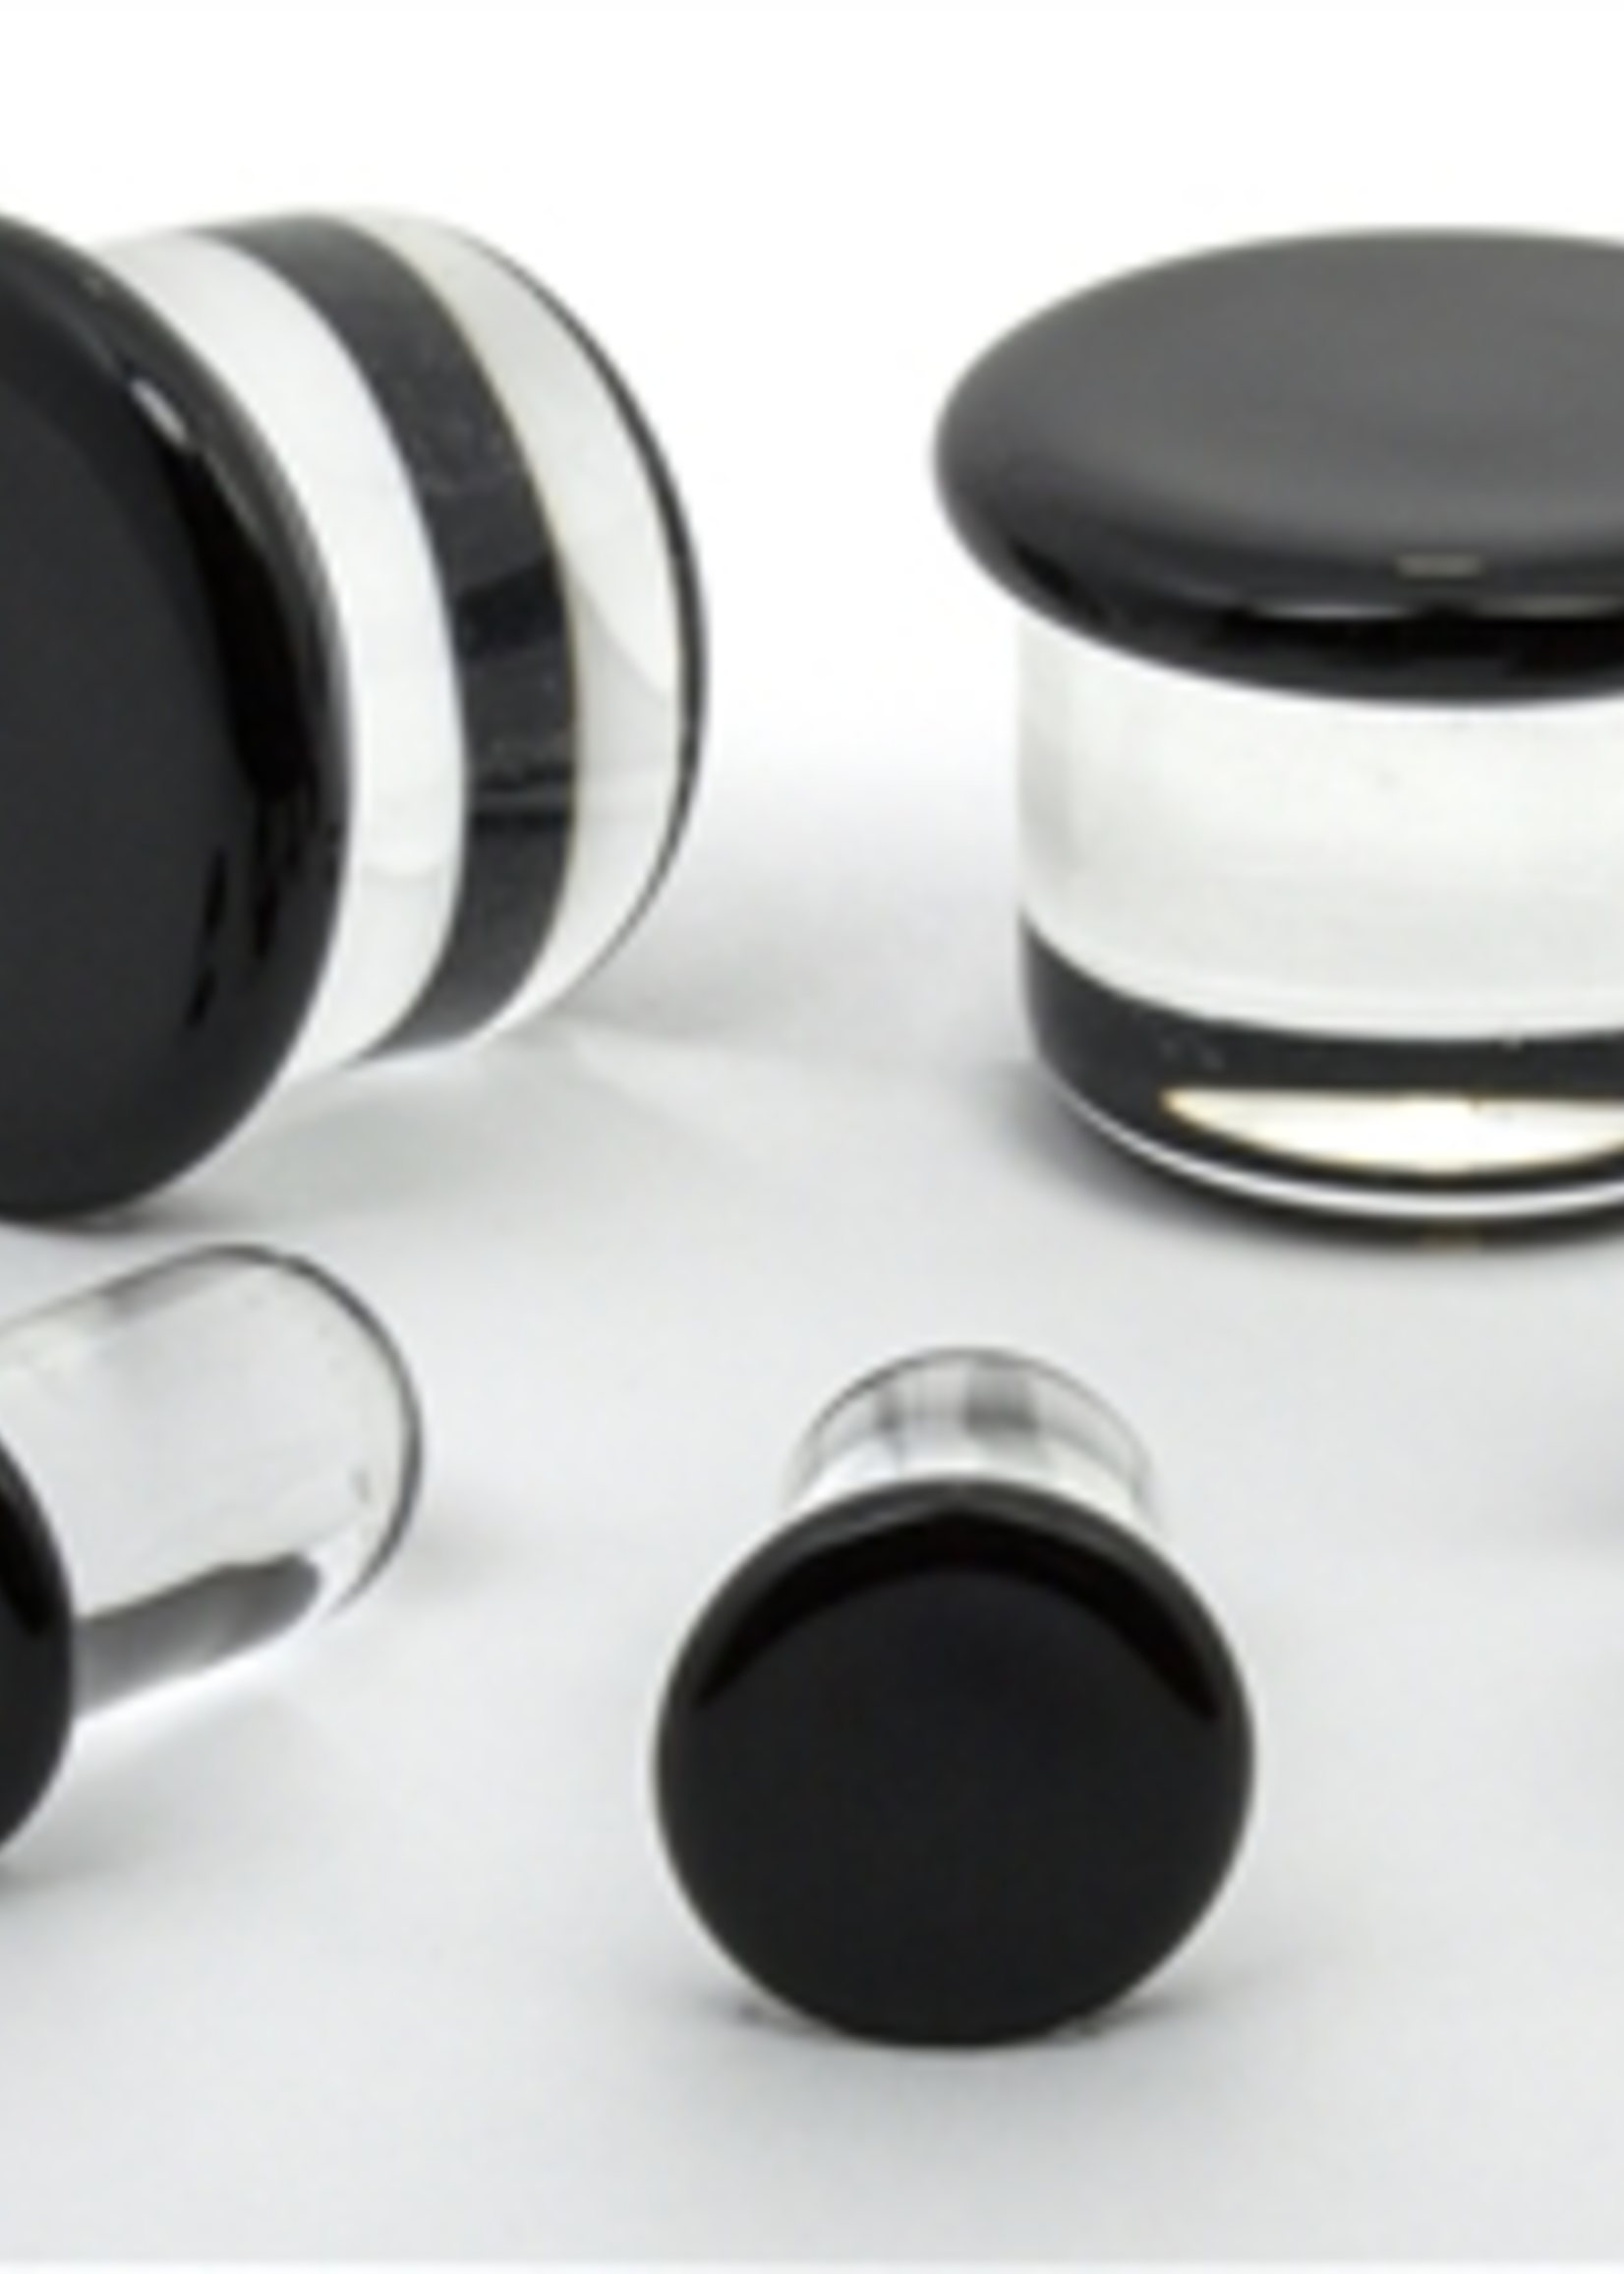 5.5mm Half Size SF Glass Plugs